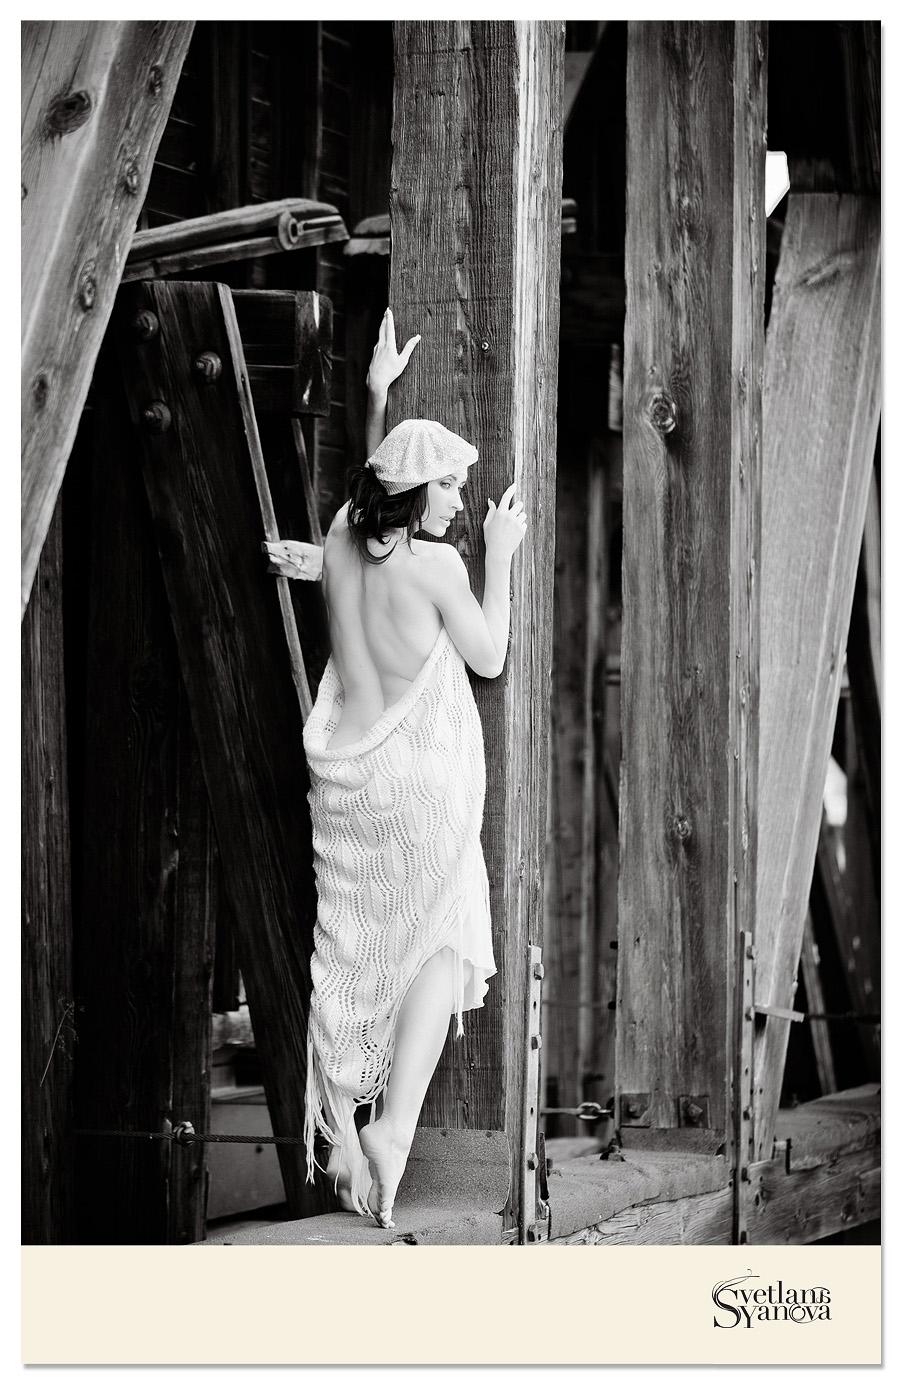 boudoir photographers calgary, calgary boudoir, calgary boudoir outside, winter boudoir outside, natural light boudoir, calgary boudoir photography, svetlana yanova, beautiful boudoir photographs, glamour, beauty photos